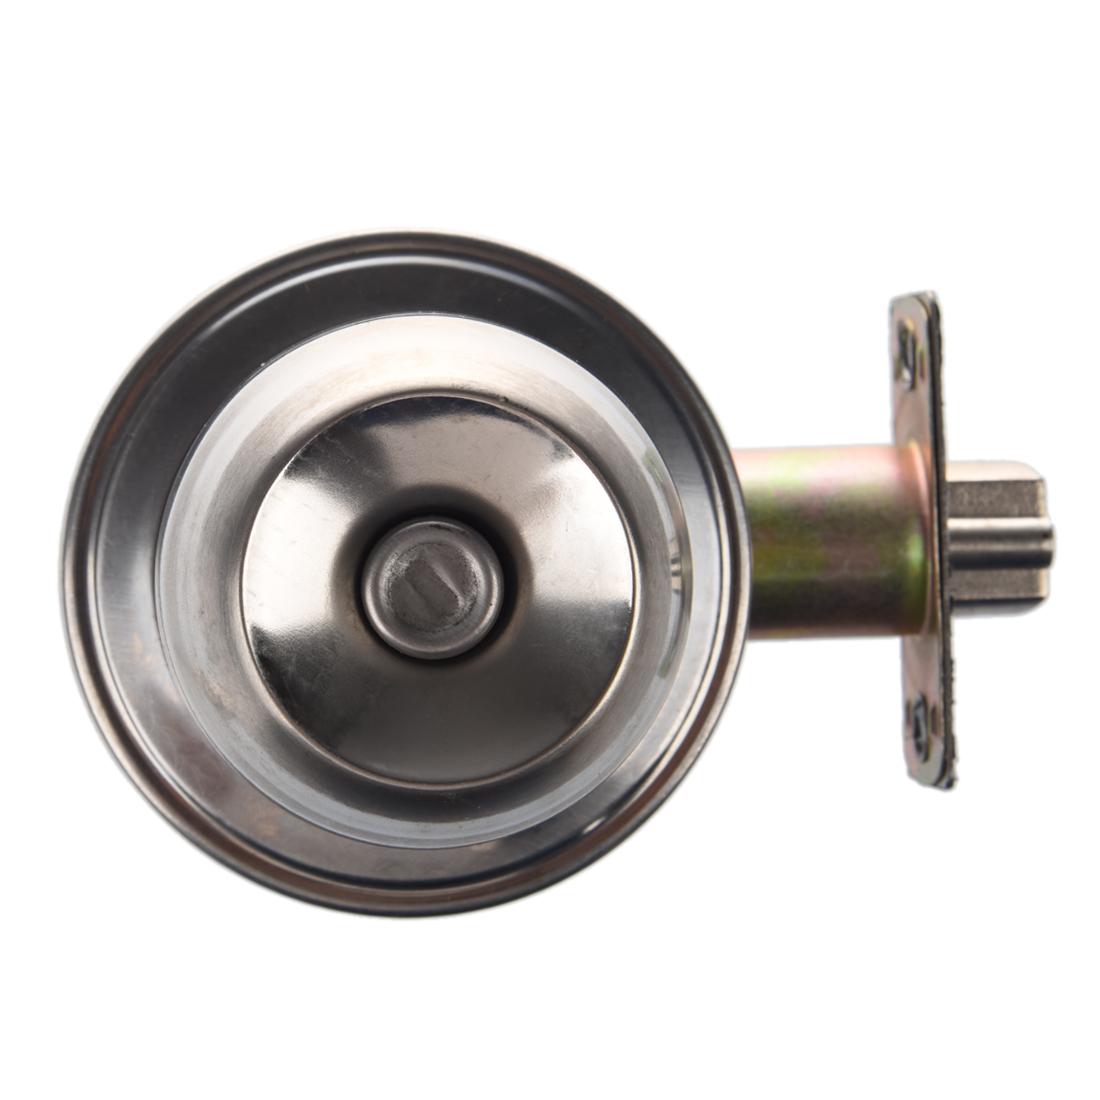 door knob with key photo - 12